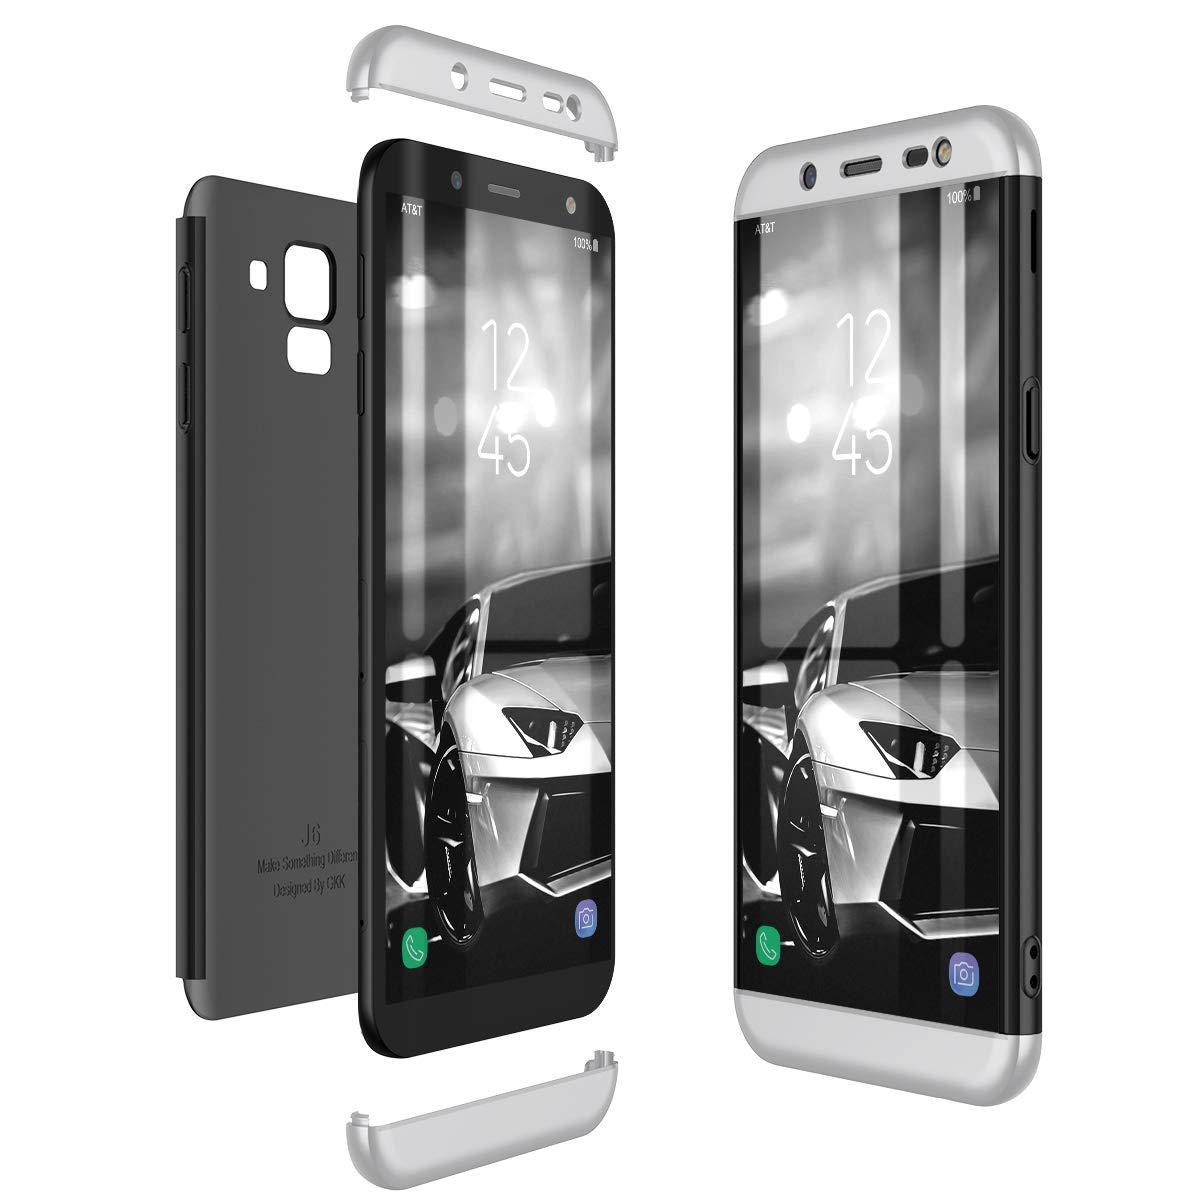 Rot CE-Link Kompatibel mit Samsung Galaxy J6 2018 H/ülle Hardcase 3 in 1 Handyh/ülle 360 Grad Schutz Ultra D/ünn Slim Hard Hartschale Grad Full Body Case Cover Hart PC Bumper